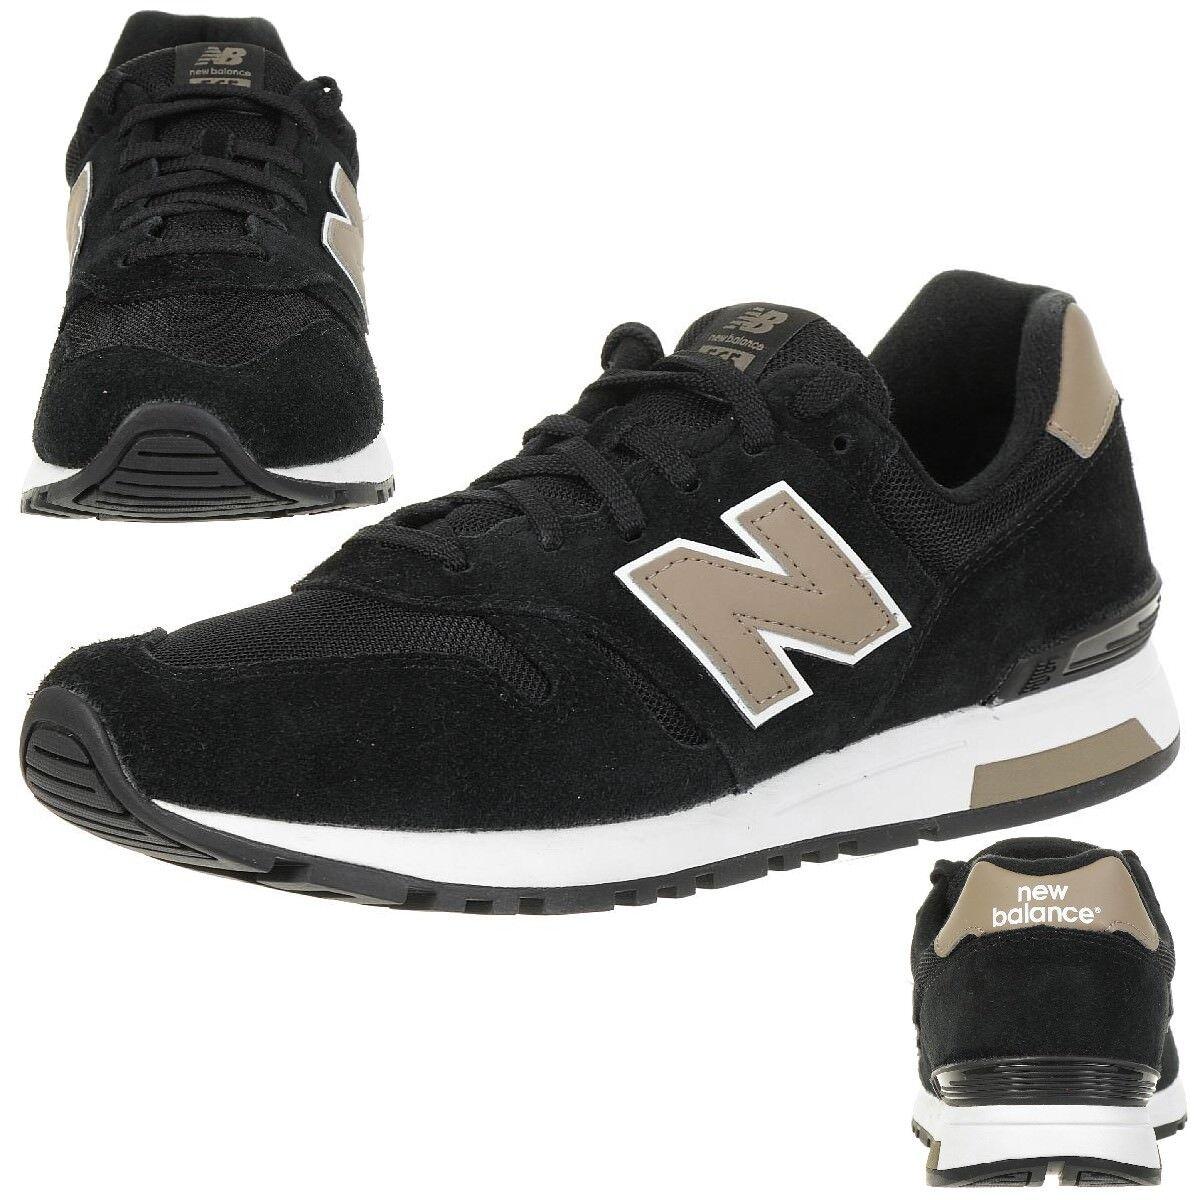 New Balance ML565SKB Classic Sneaker Herren Schuhe Laufschuhe ML565 SKB